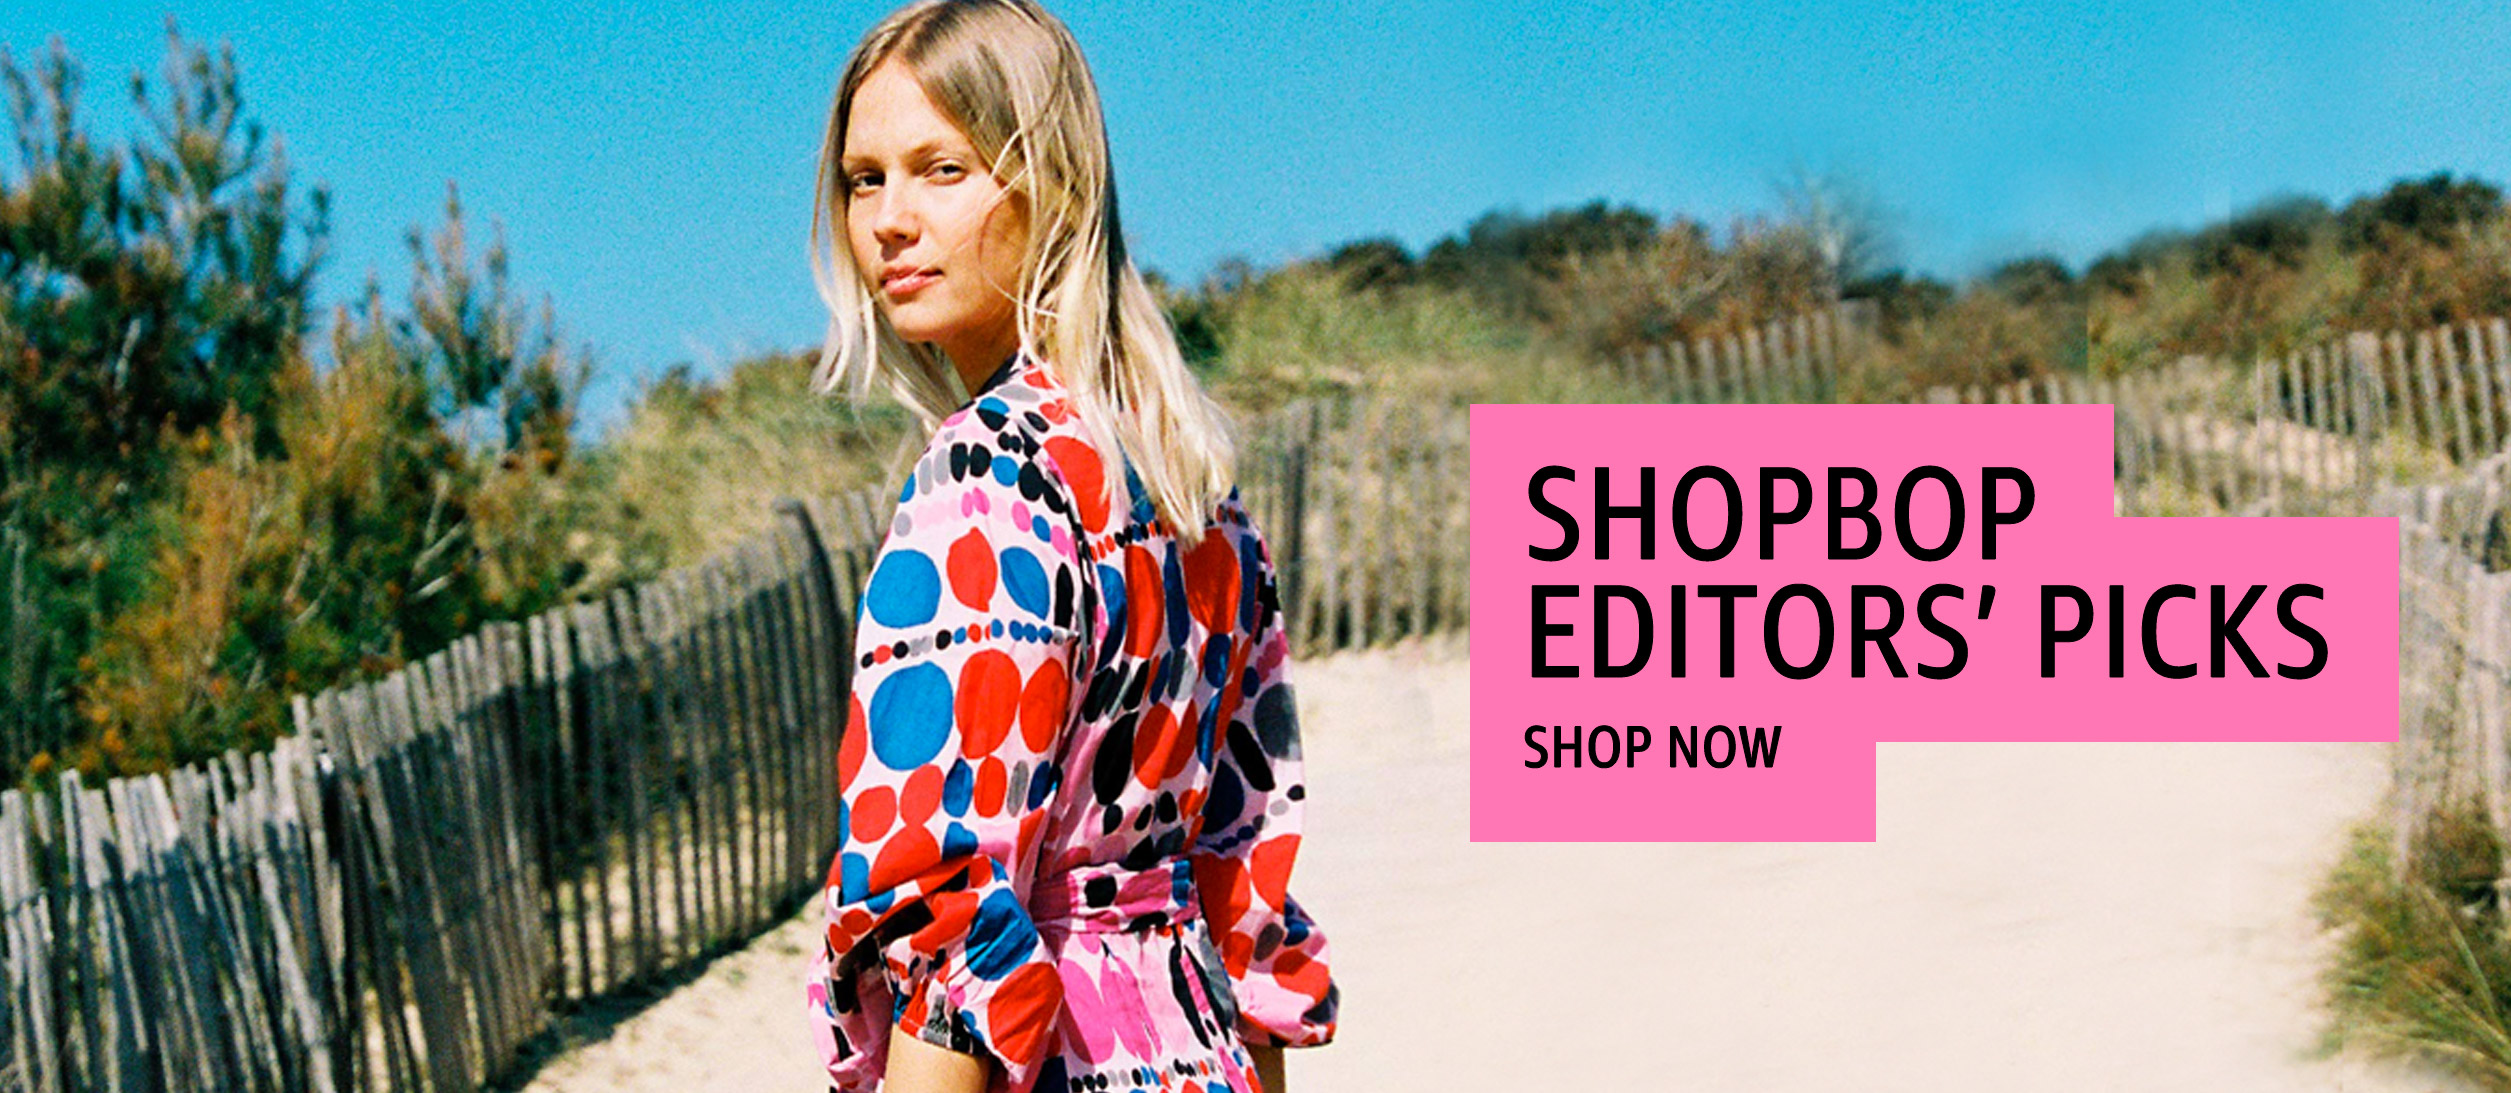 Shopbop editors' picks